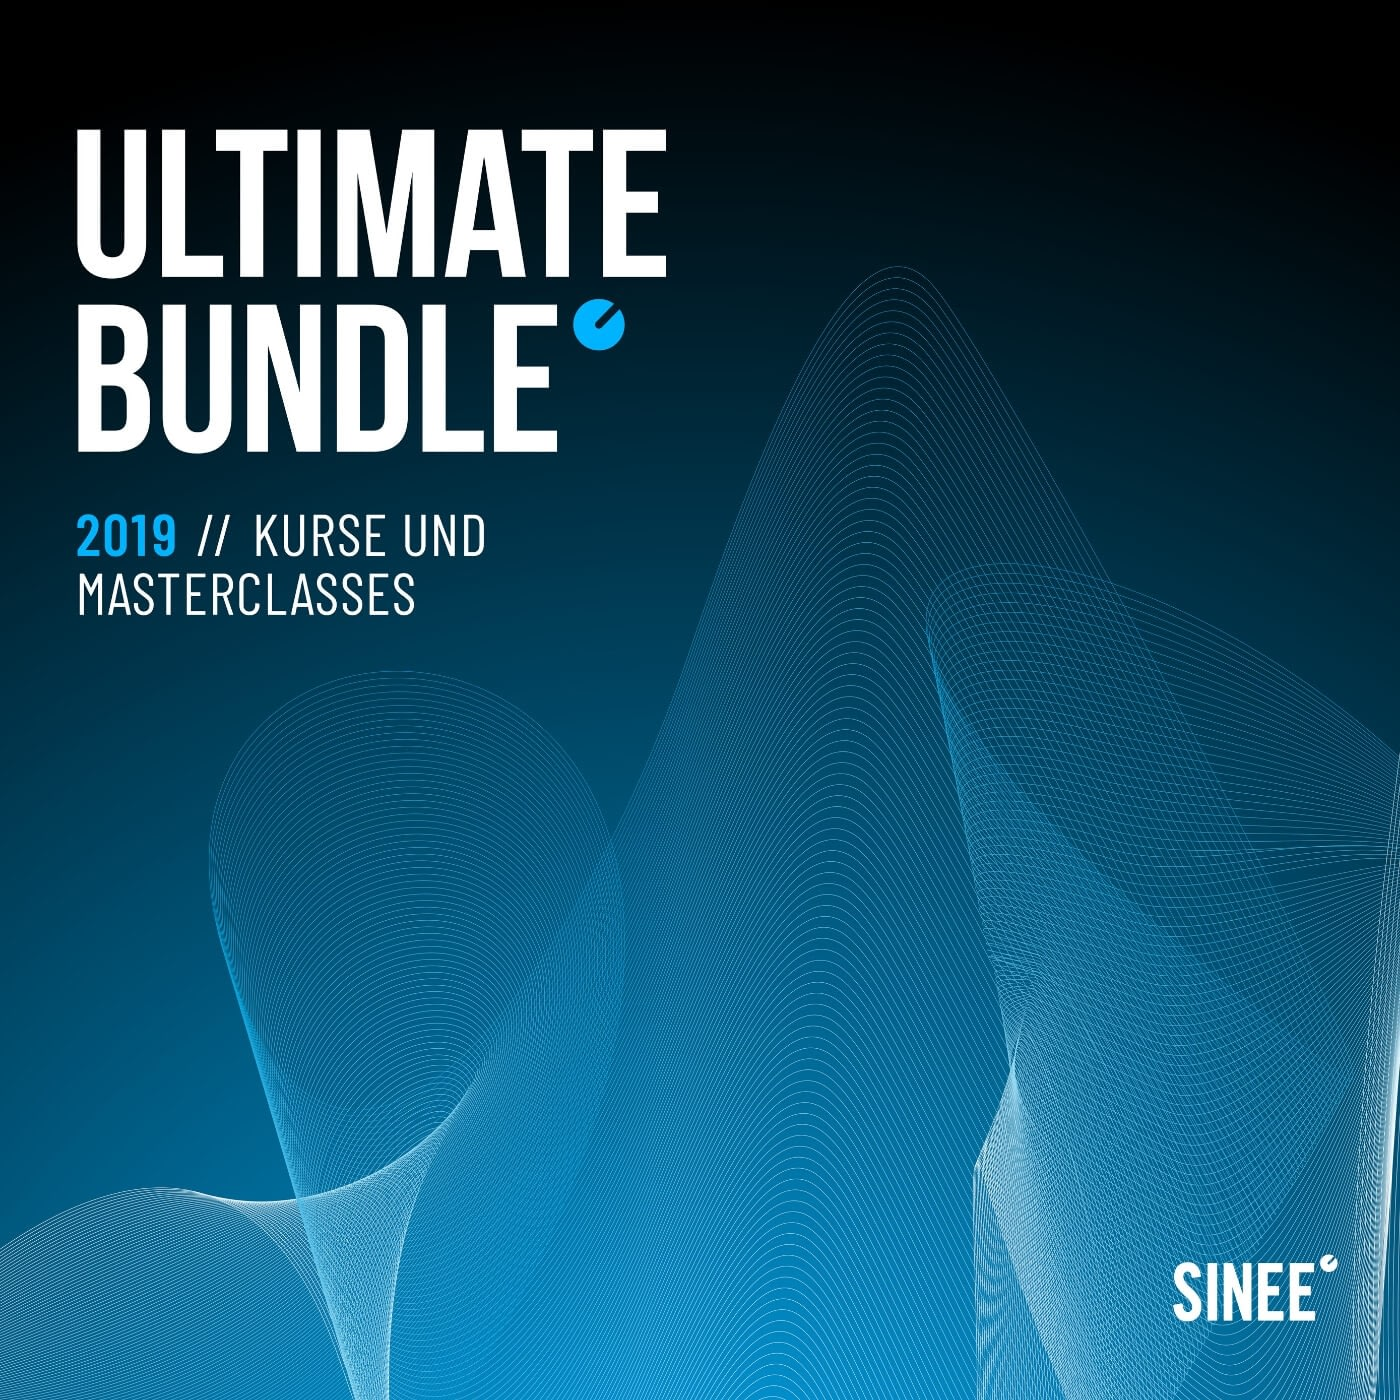 Ultimate Bundle 2019 – Kurse & Masterclasses